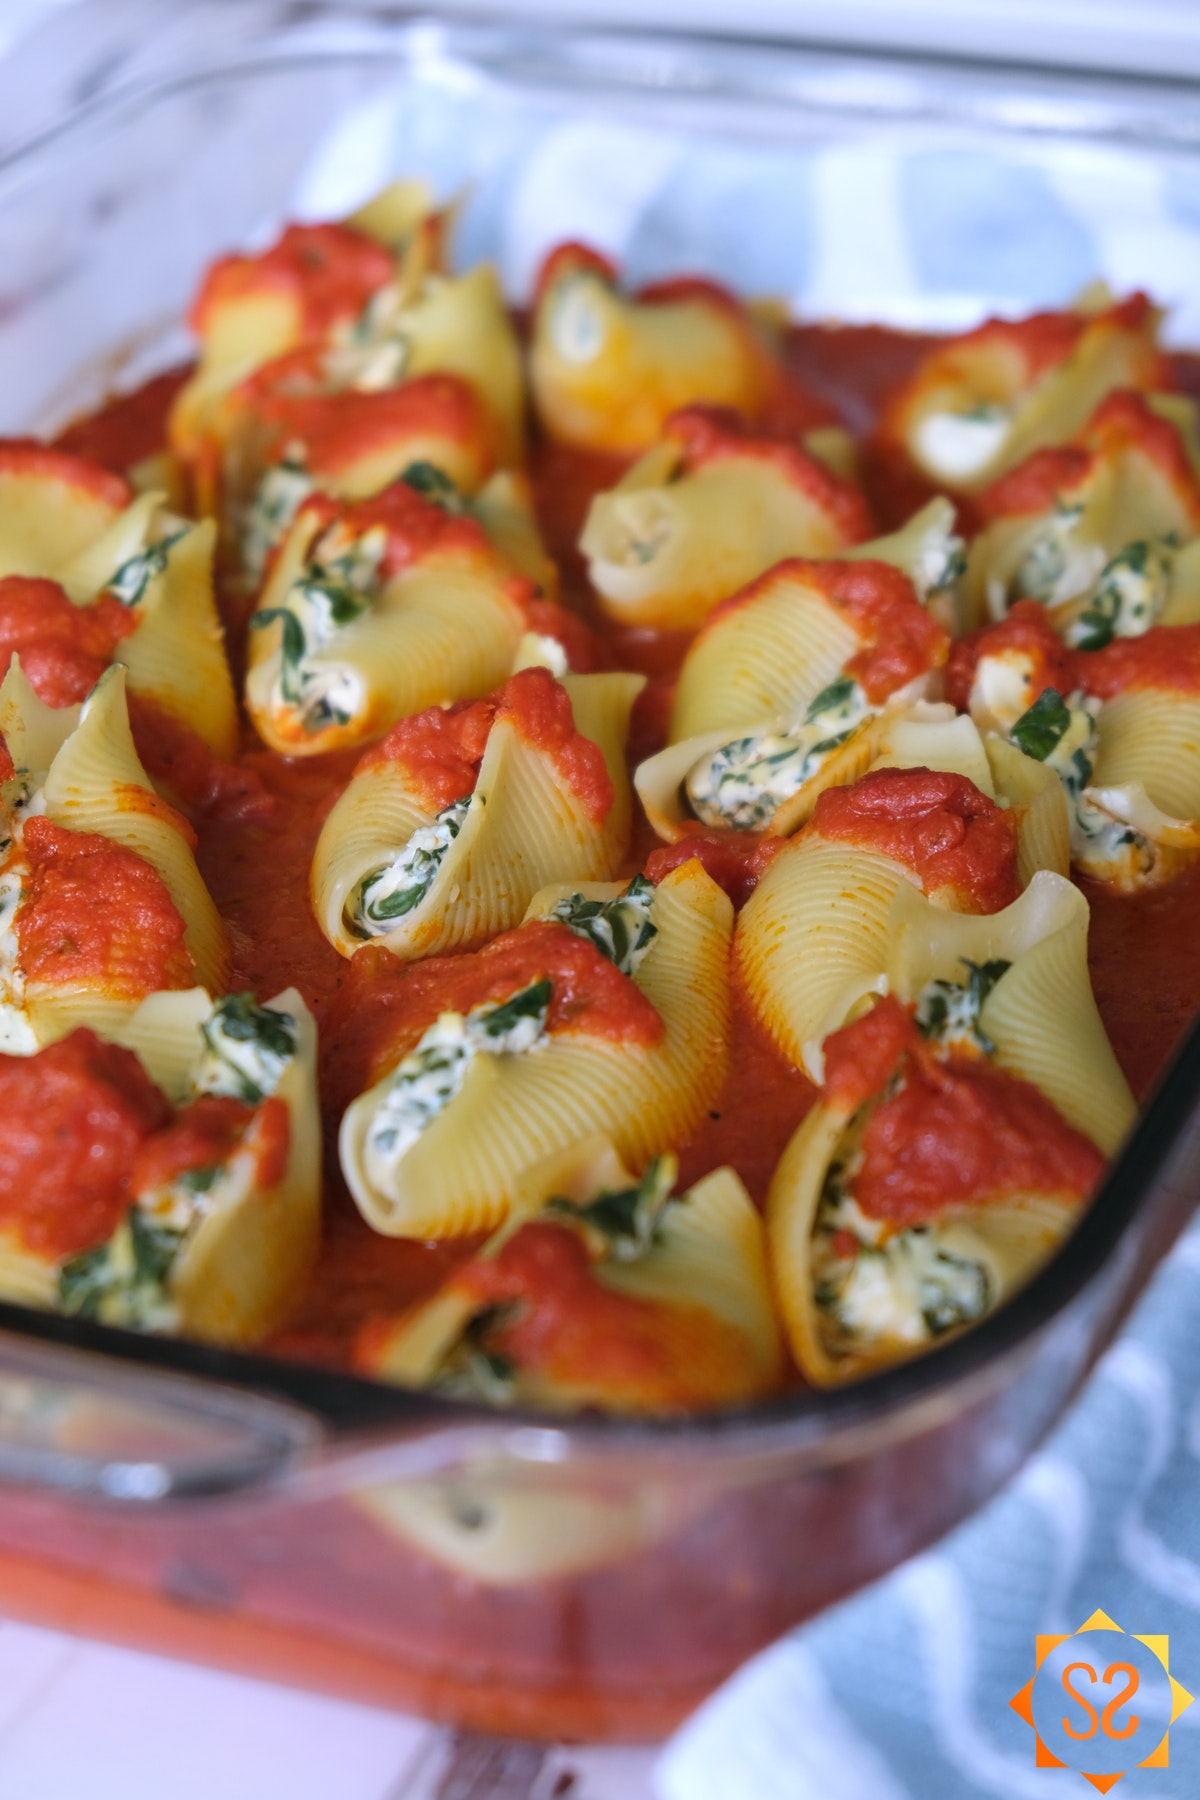 Vegan stuffed shells with tofu and spinach ricotta